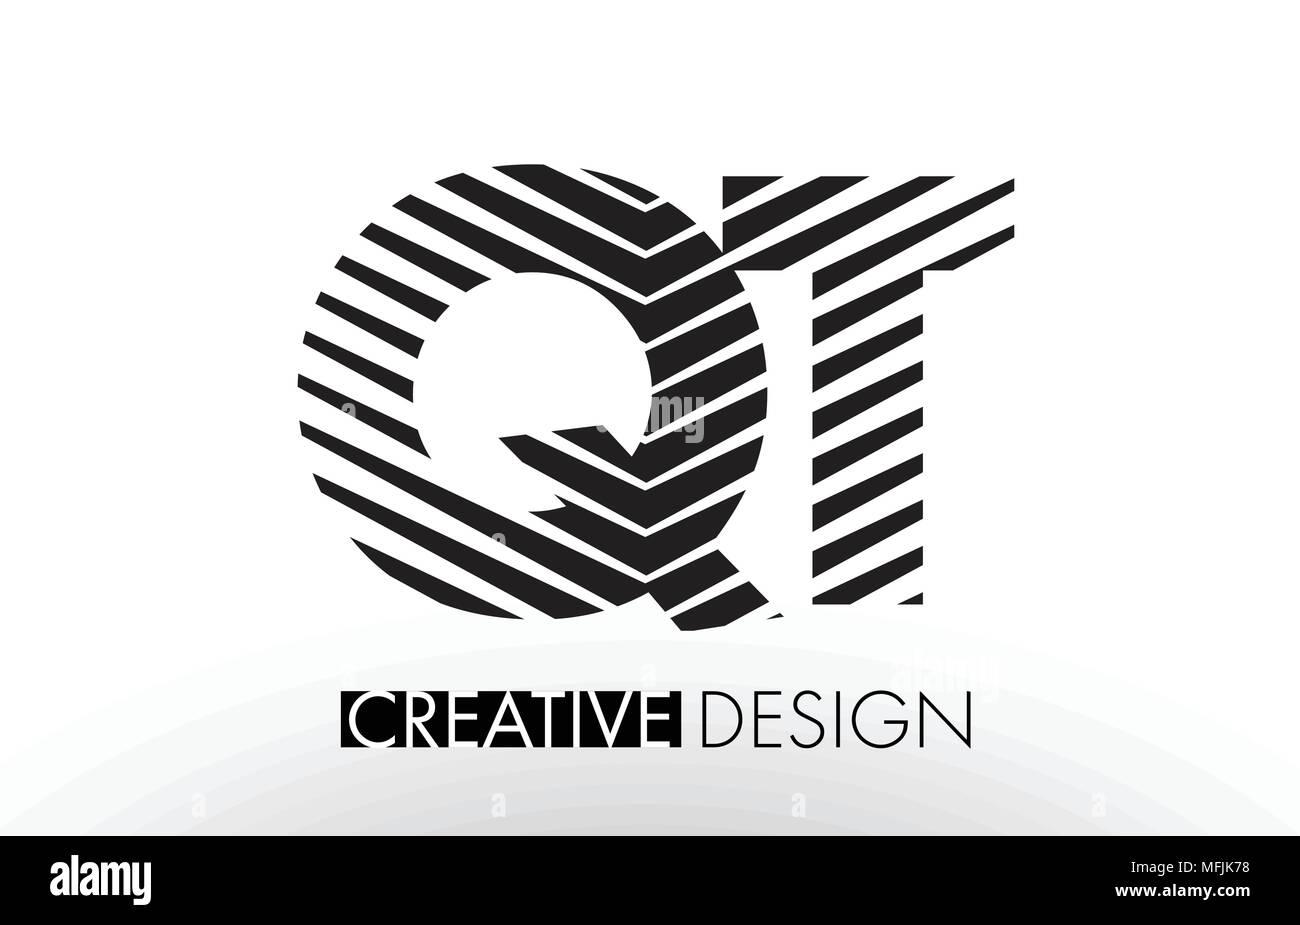 QT Q T Lines Letter Design with Creative Elegant Zebra Vector Illustration. - Stock Image